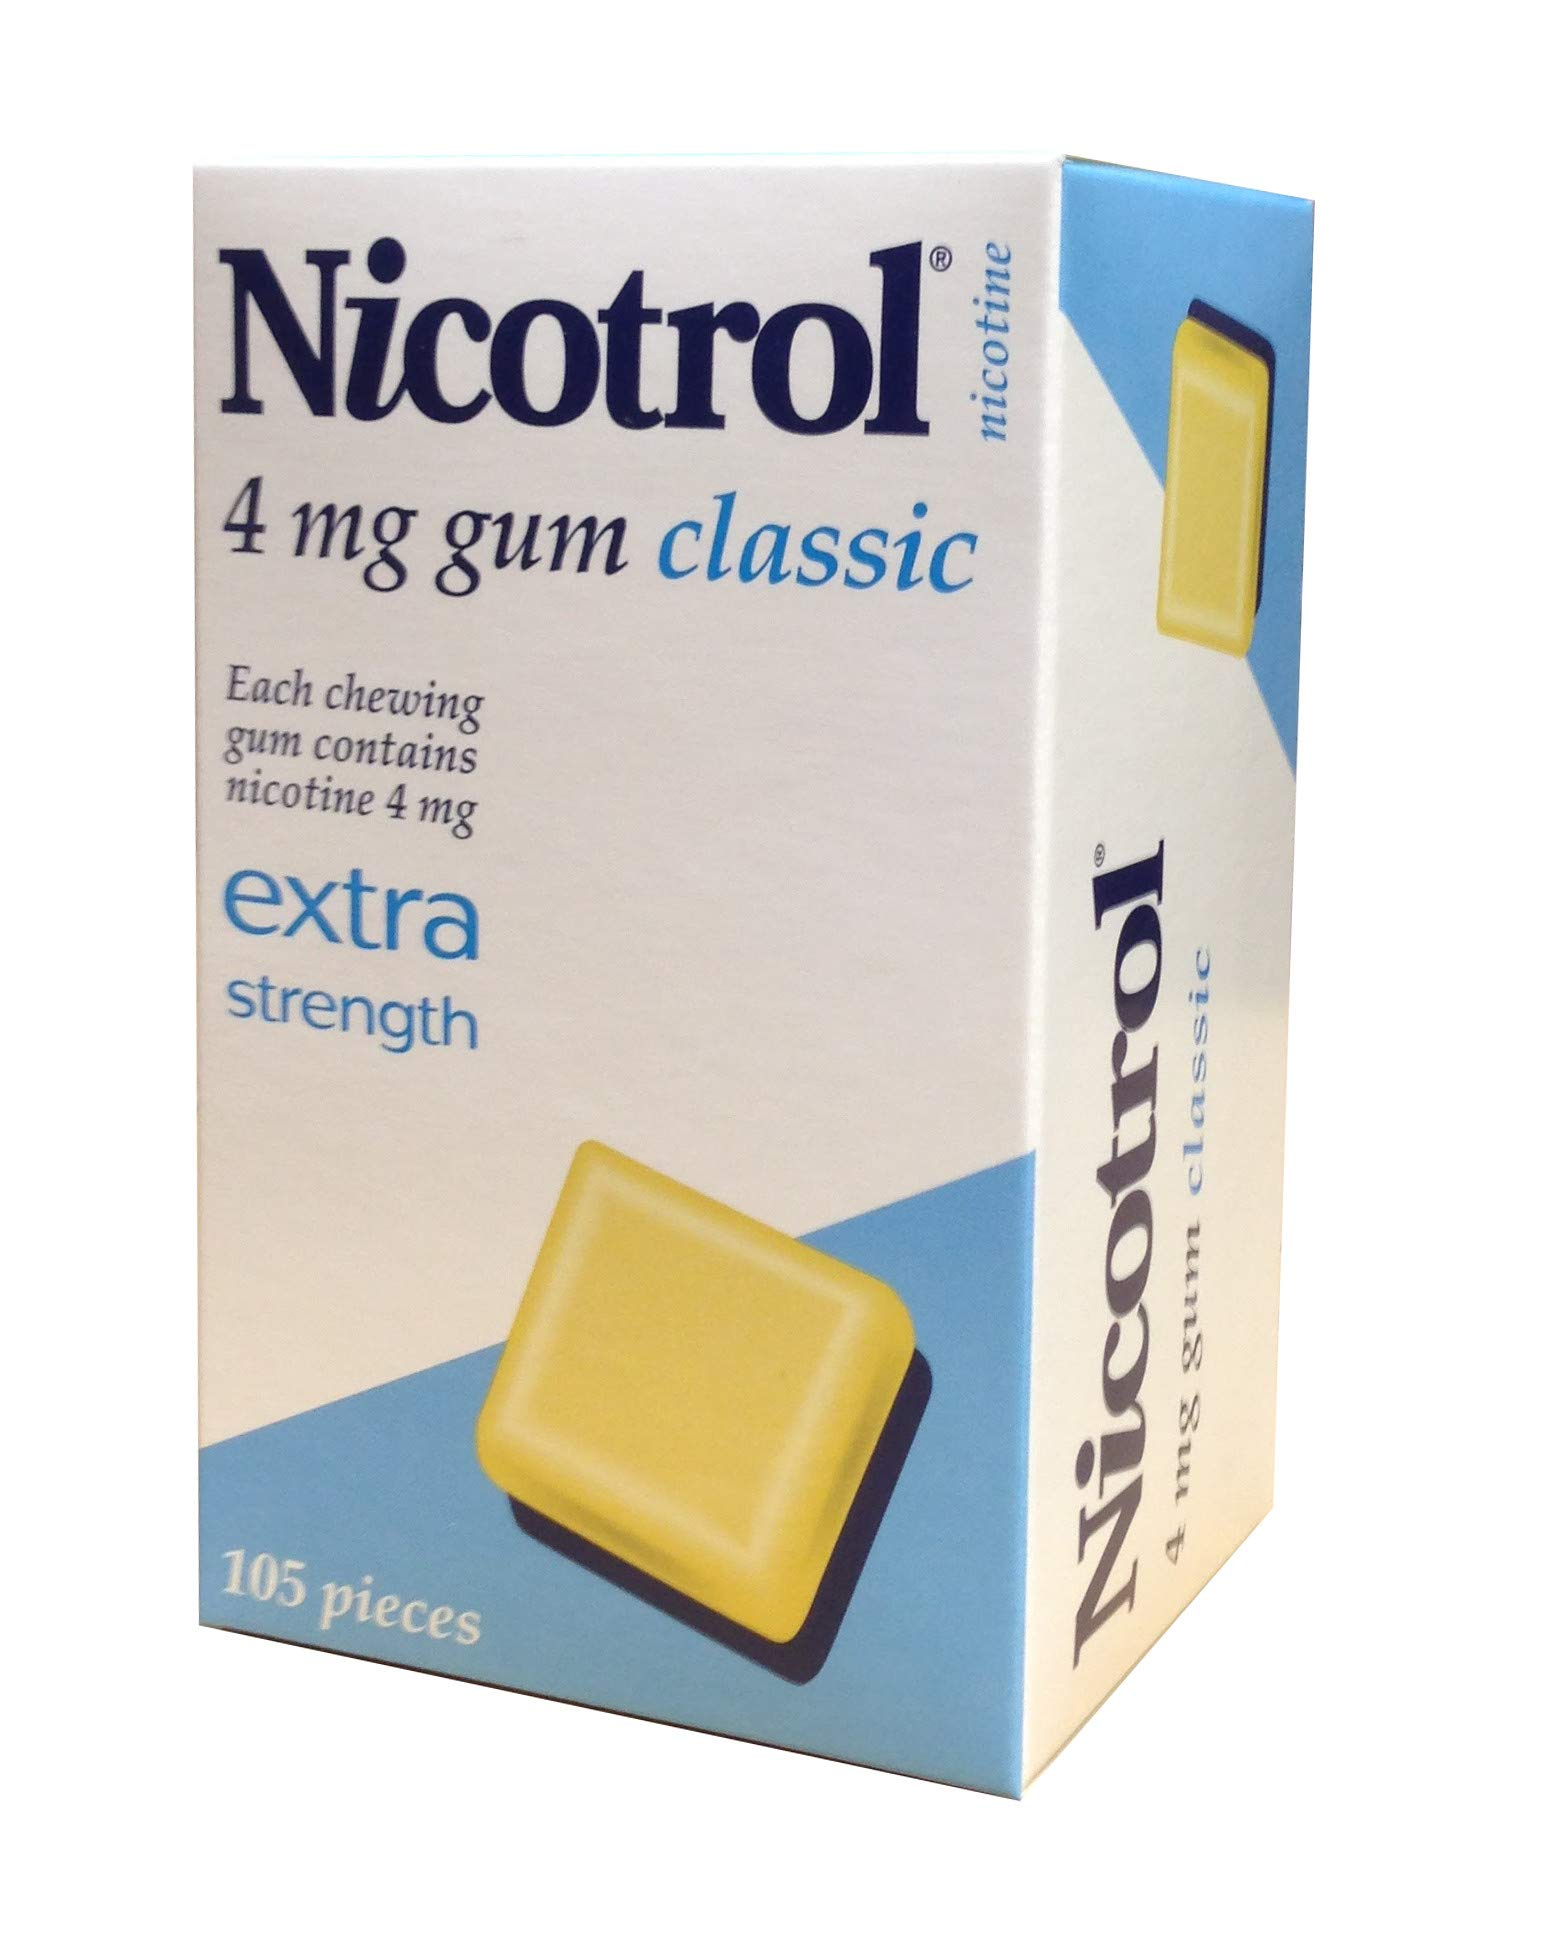 Nicotrol Nicotine Gum 4mg Classic